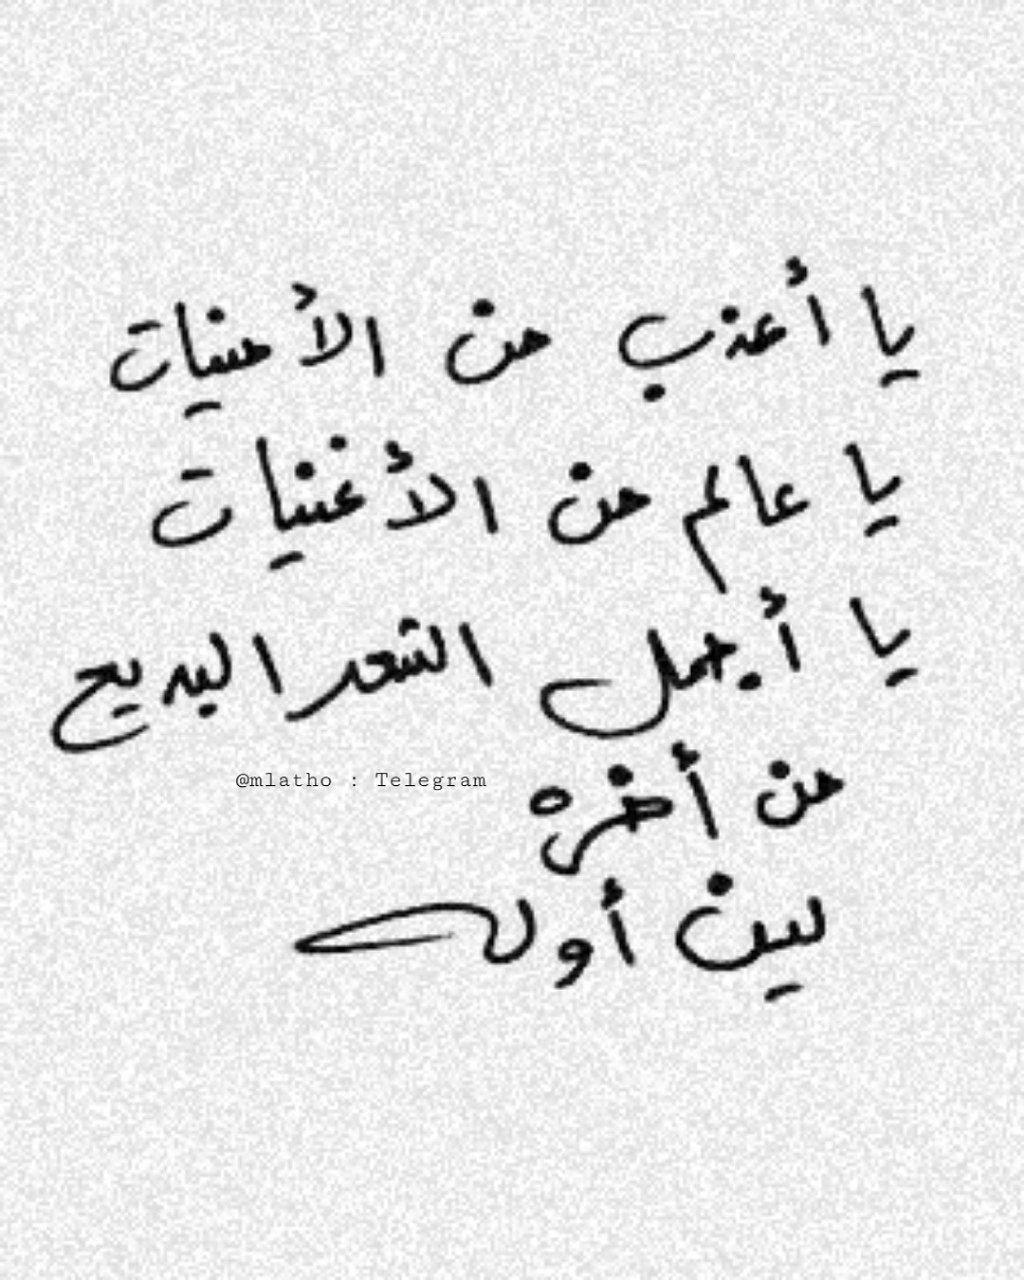 Pin By كتابك On اقتباسات موقع كتابك Arabic Calligraphy Calligraphy